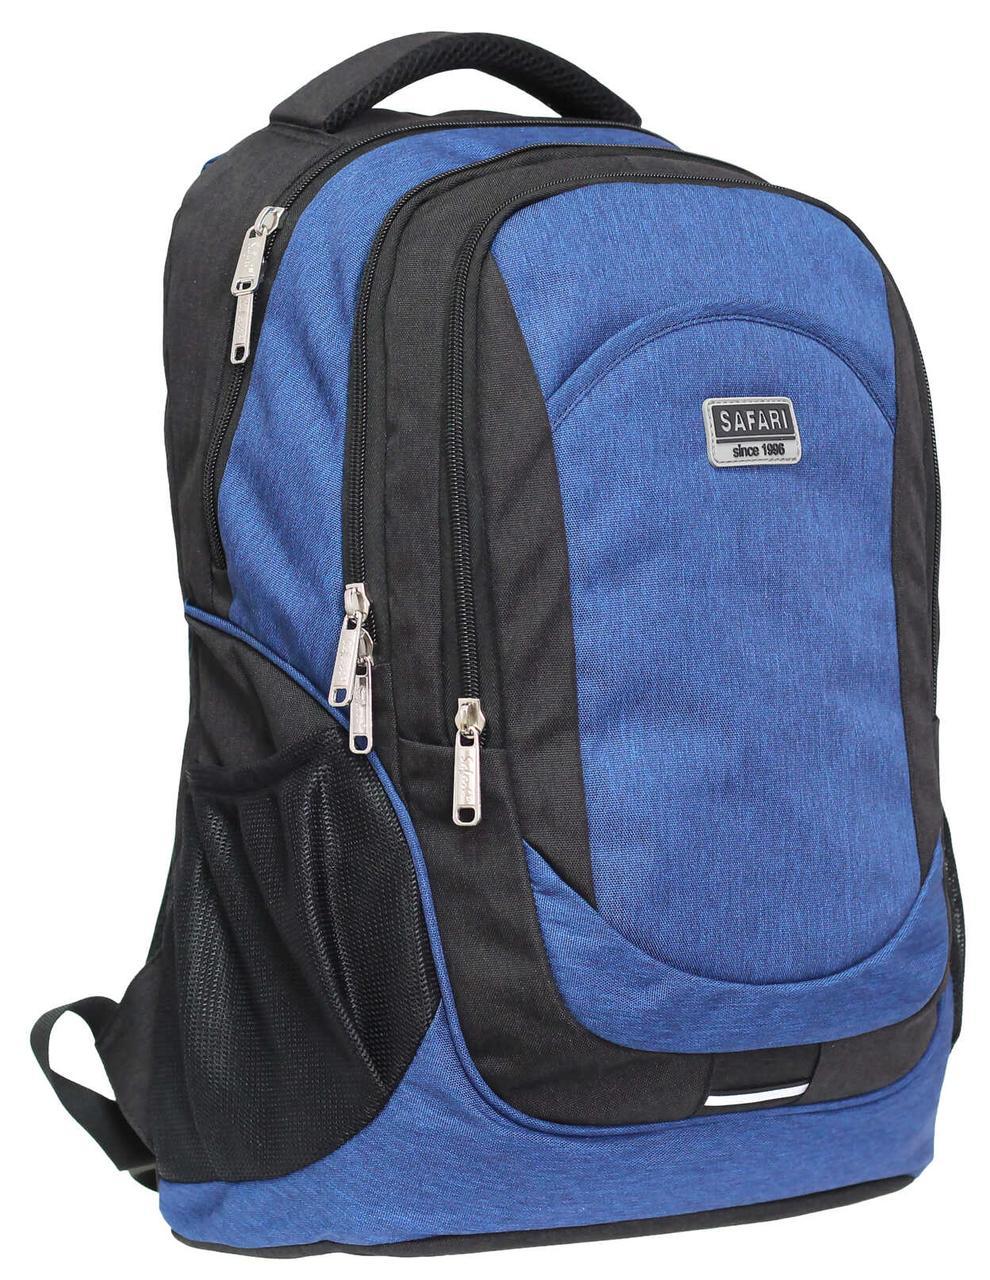 Рюкзак, 3 отделения, 47*31*18см, PL, Safari Sport, 19-136L-1, SAFARI